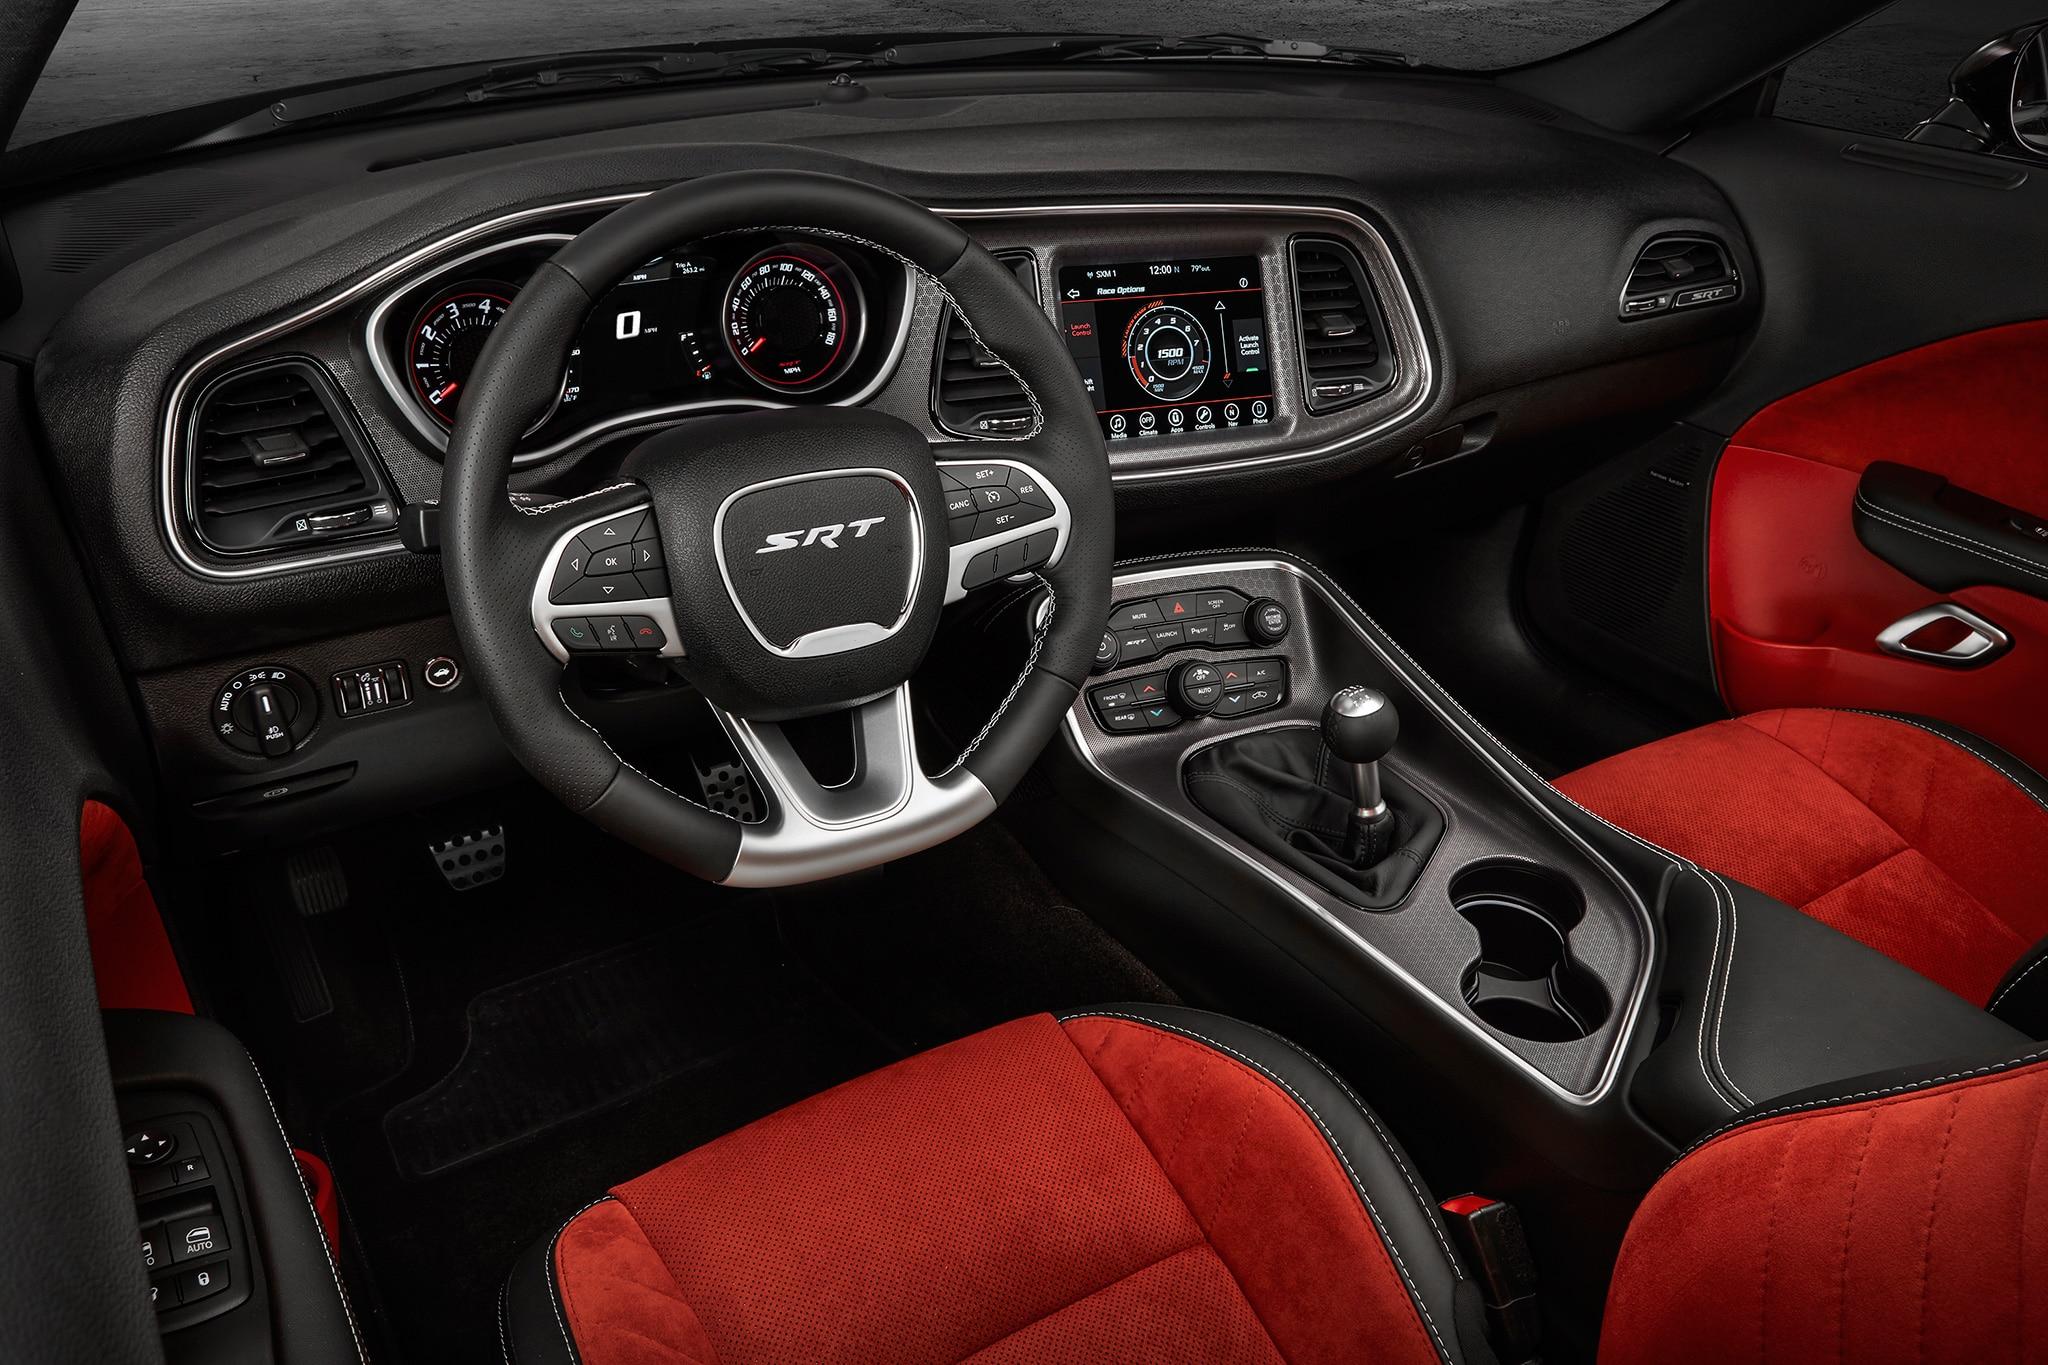 2017-Dodge-Challenger-SRT-392-cabin-01